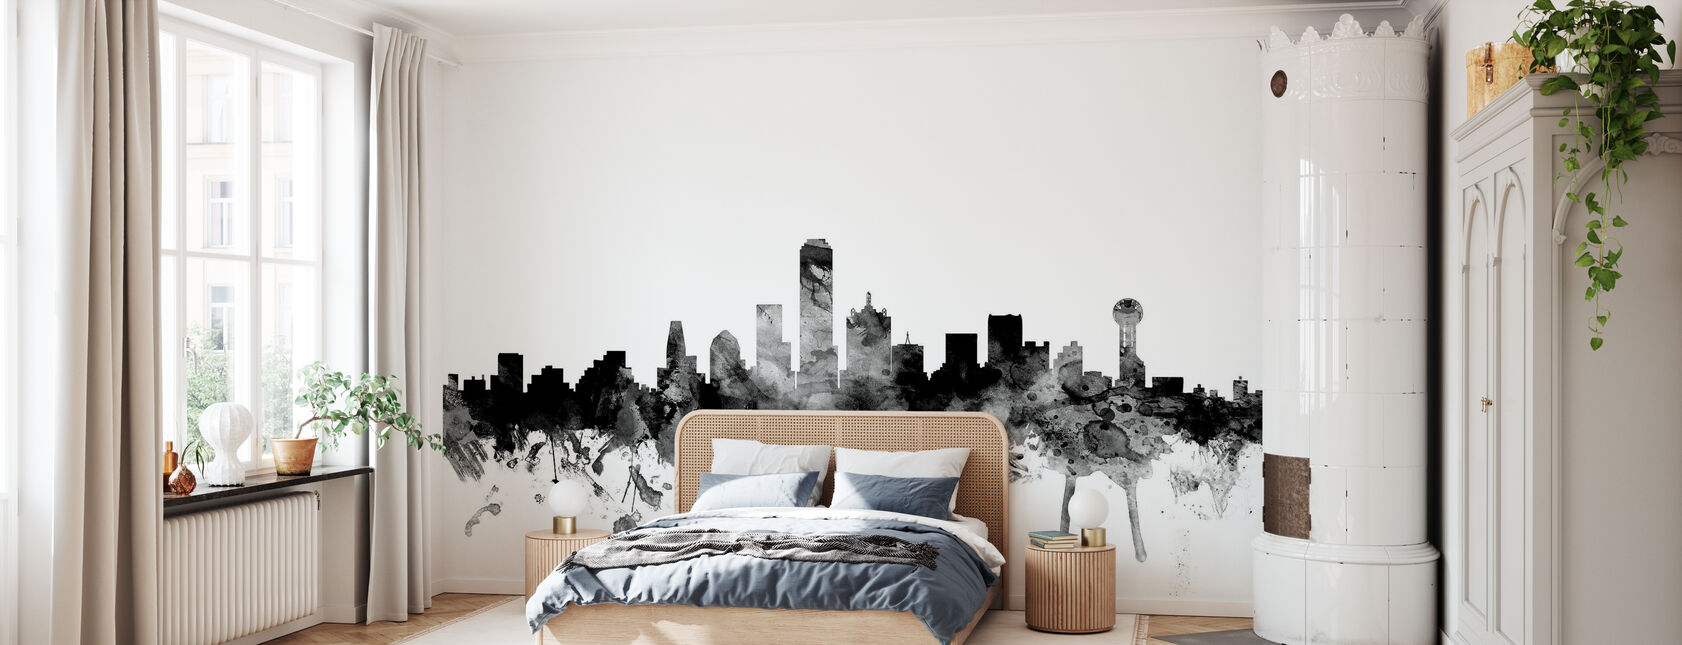 Dallas Texas Skyline Black - Wallpaper - Bedroom